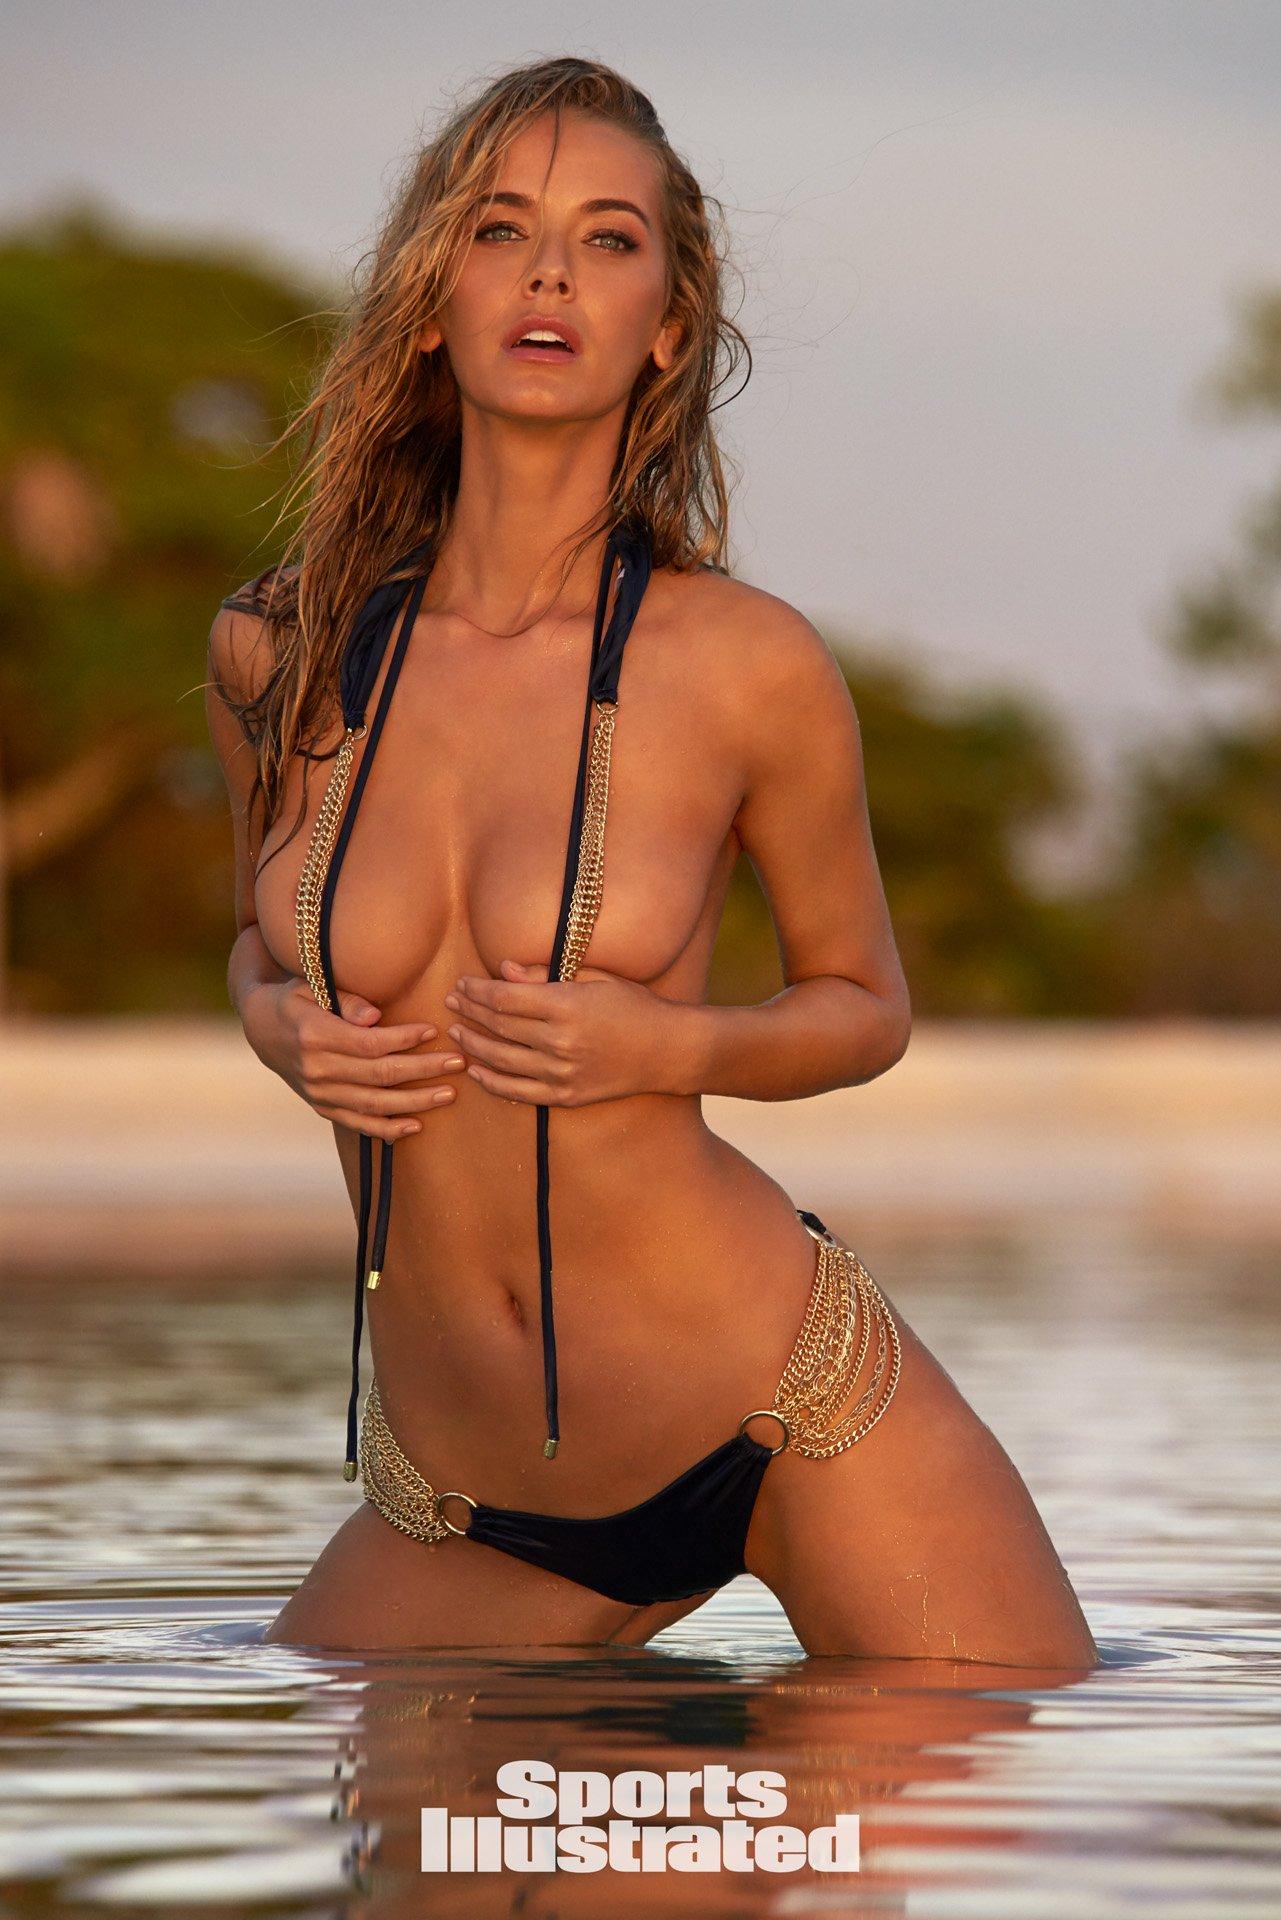 Olivia Jordan - Sports Illustrated Swimsuit Issue (2018)